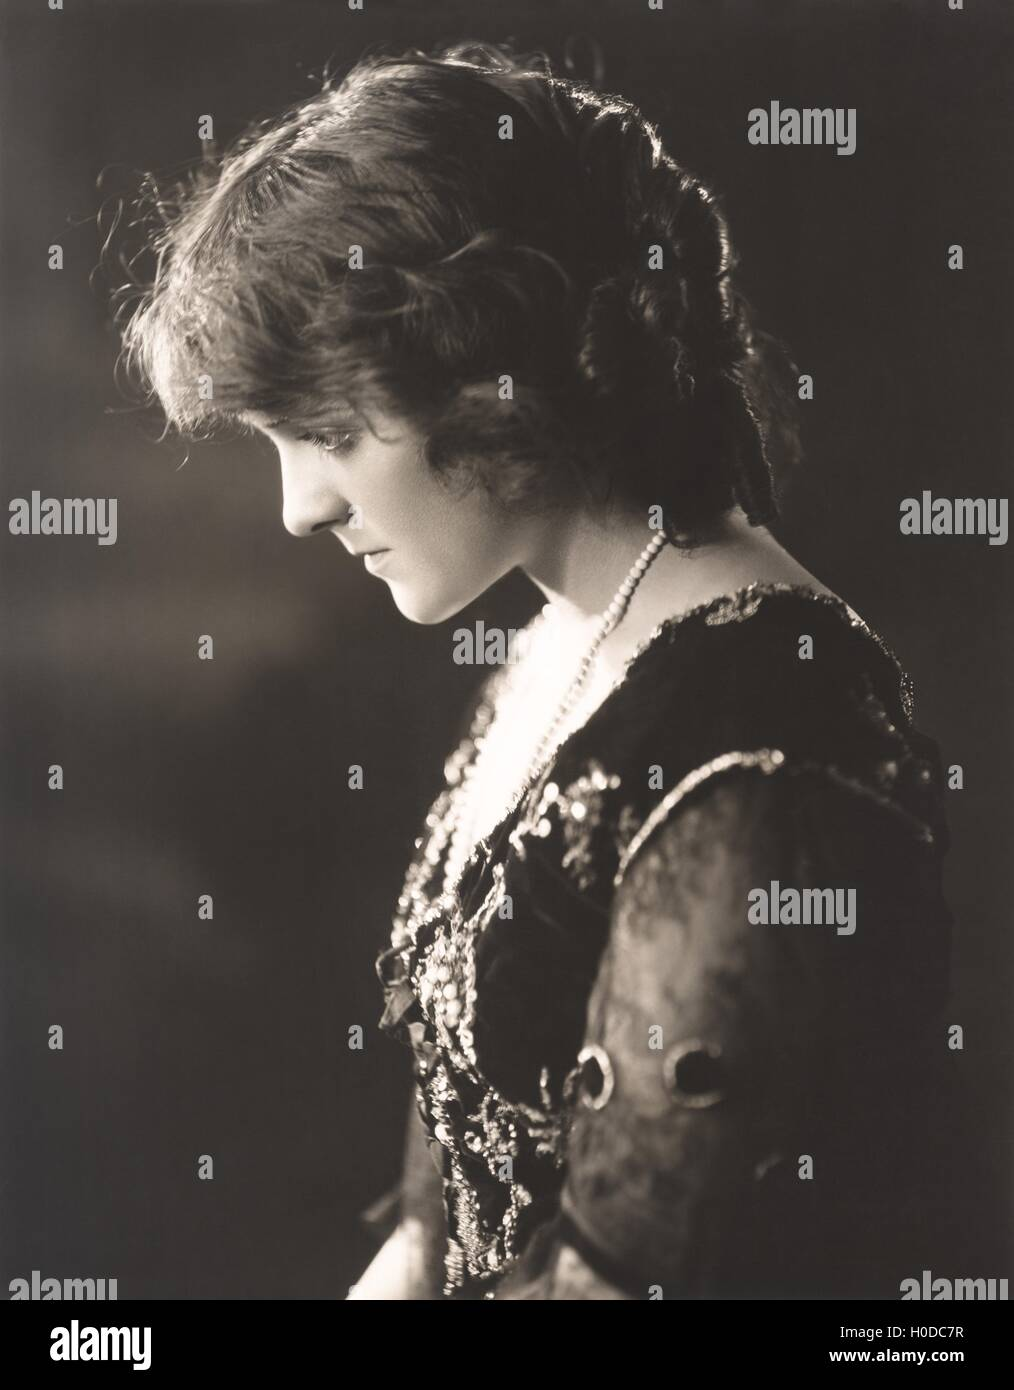 Portrait of a pensive woman - Stock Image